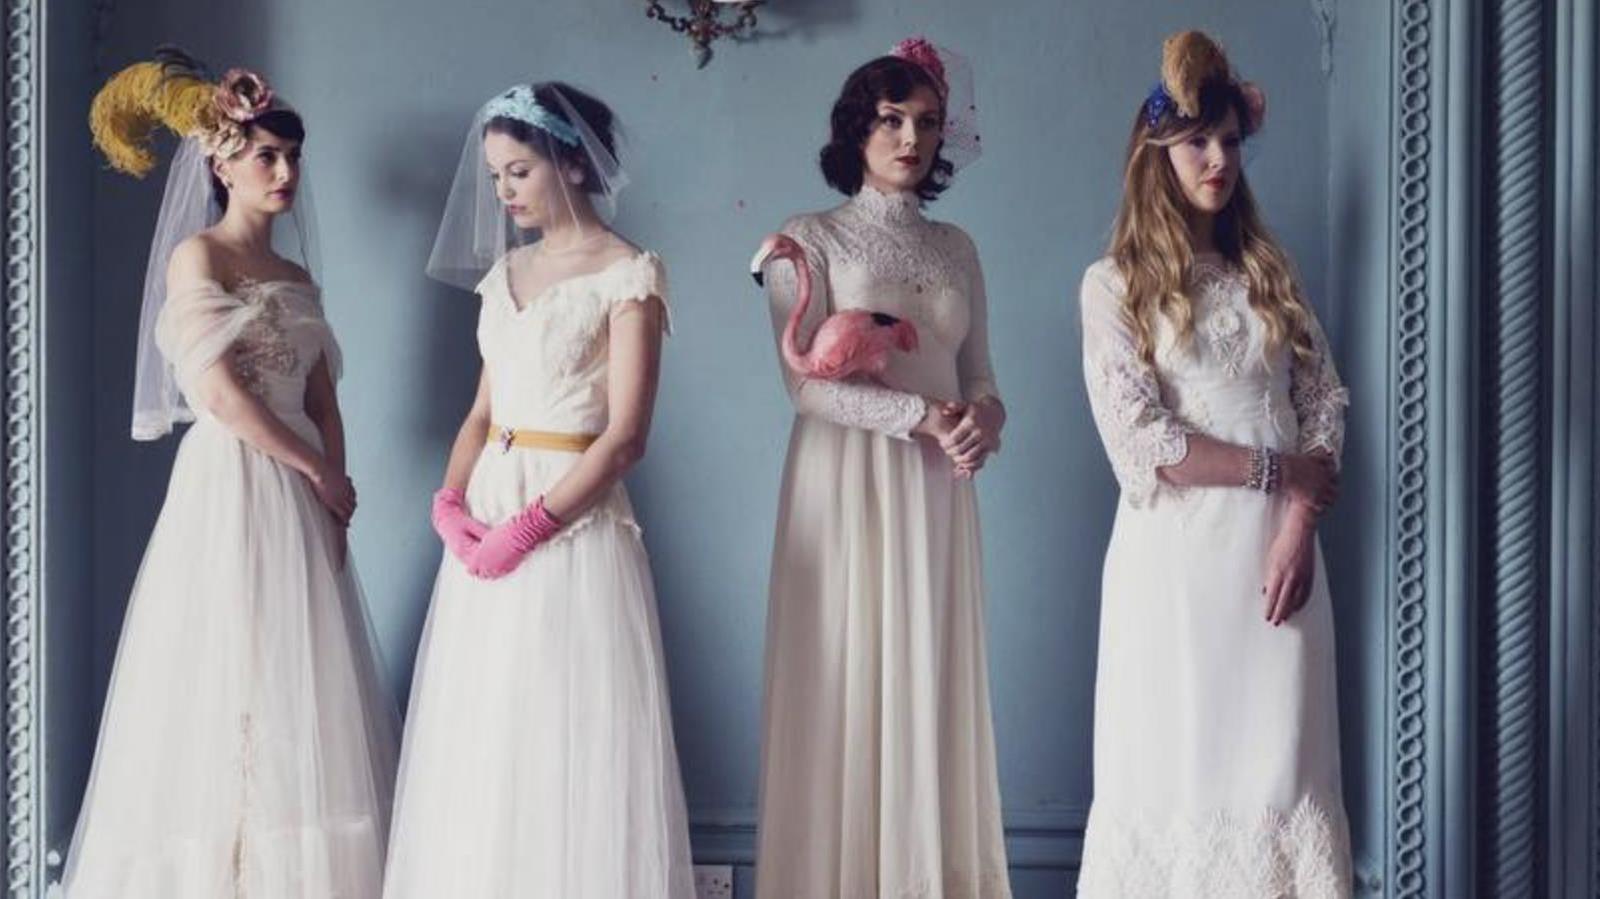 Alternative wedding dresses that won\'t break the bank